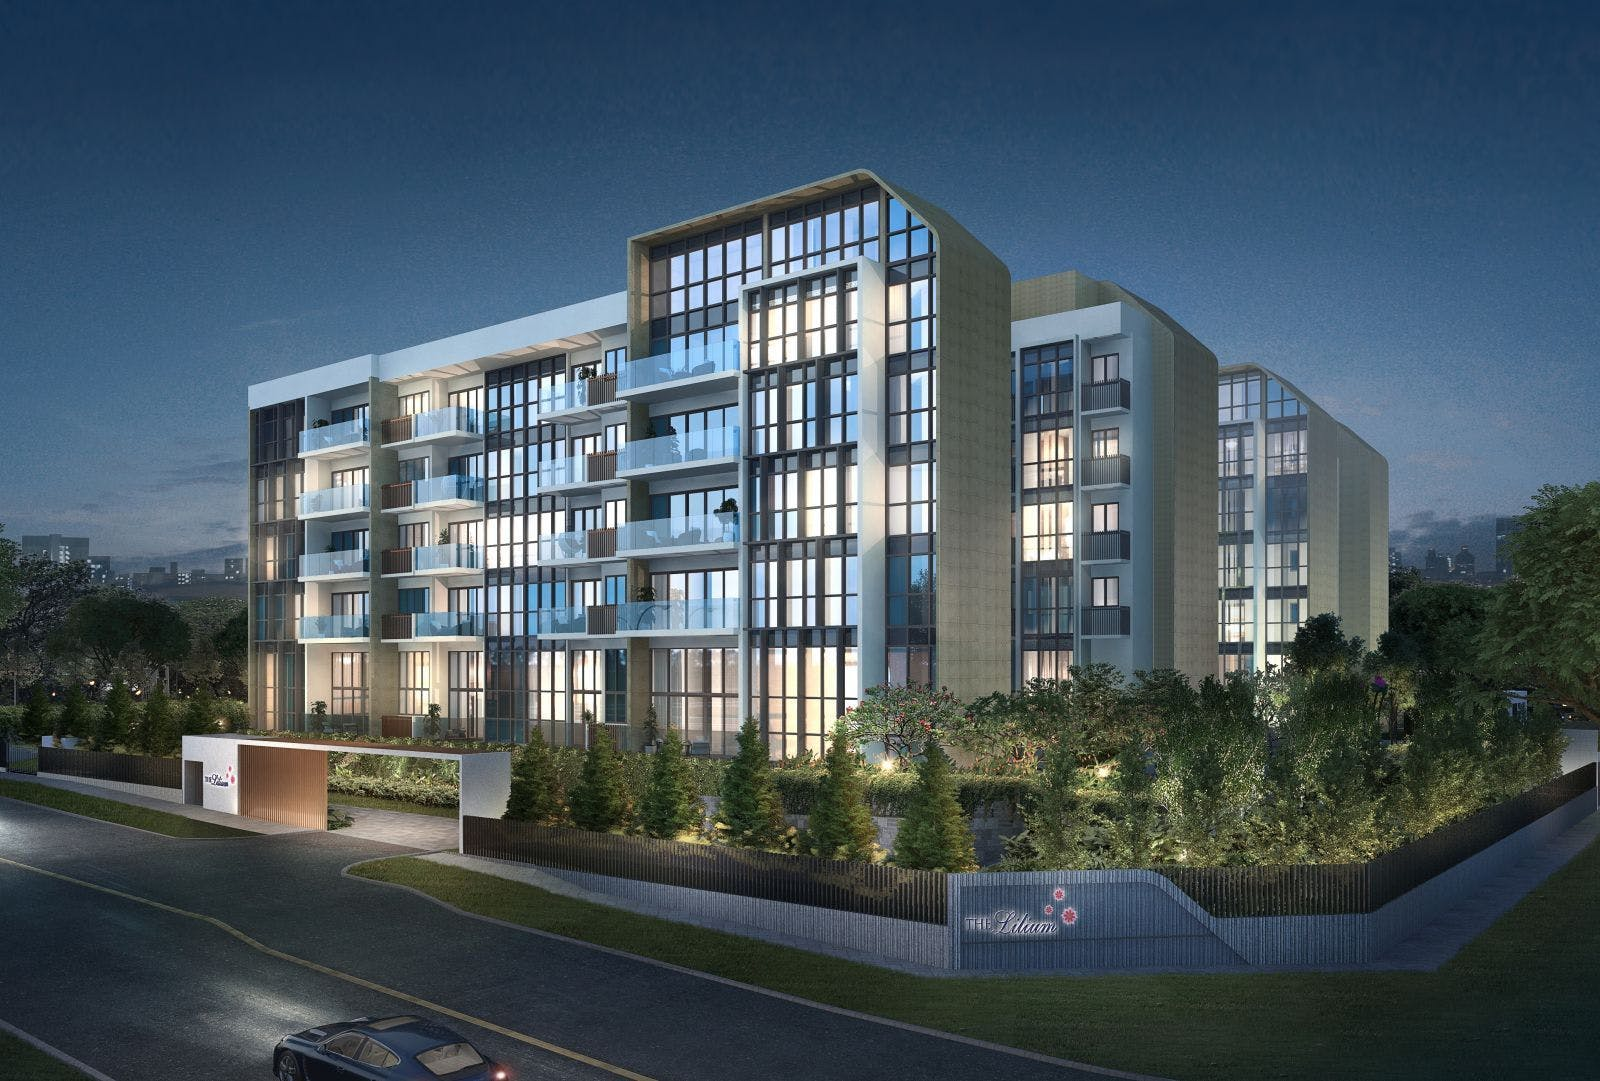 The Lilium Condo Prices Reviews Property 99 Co